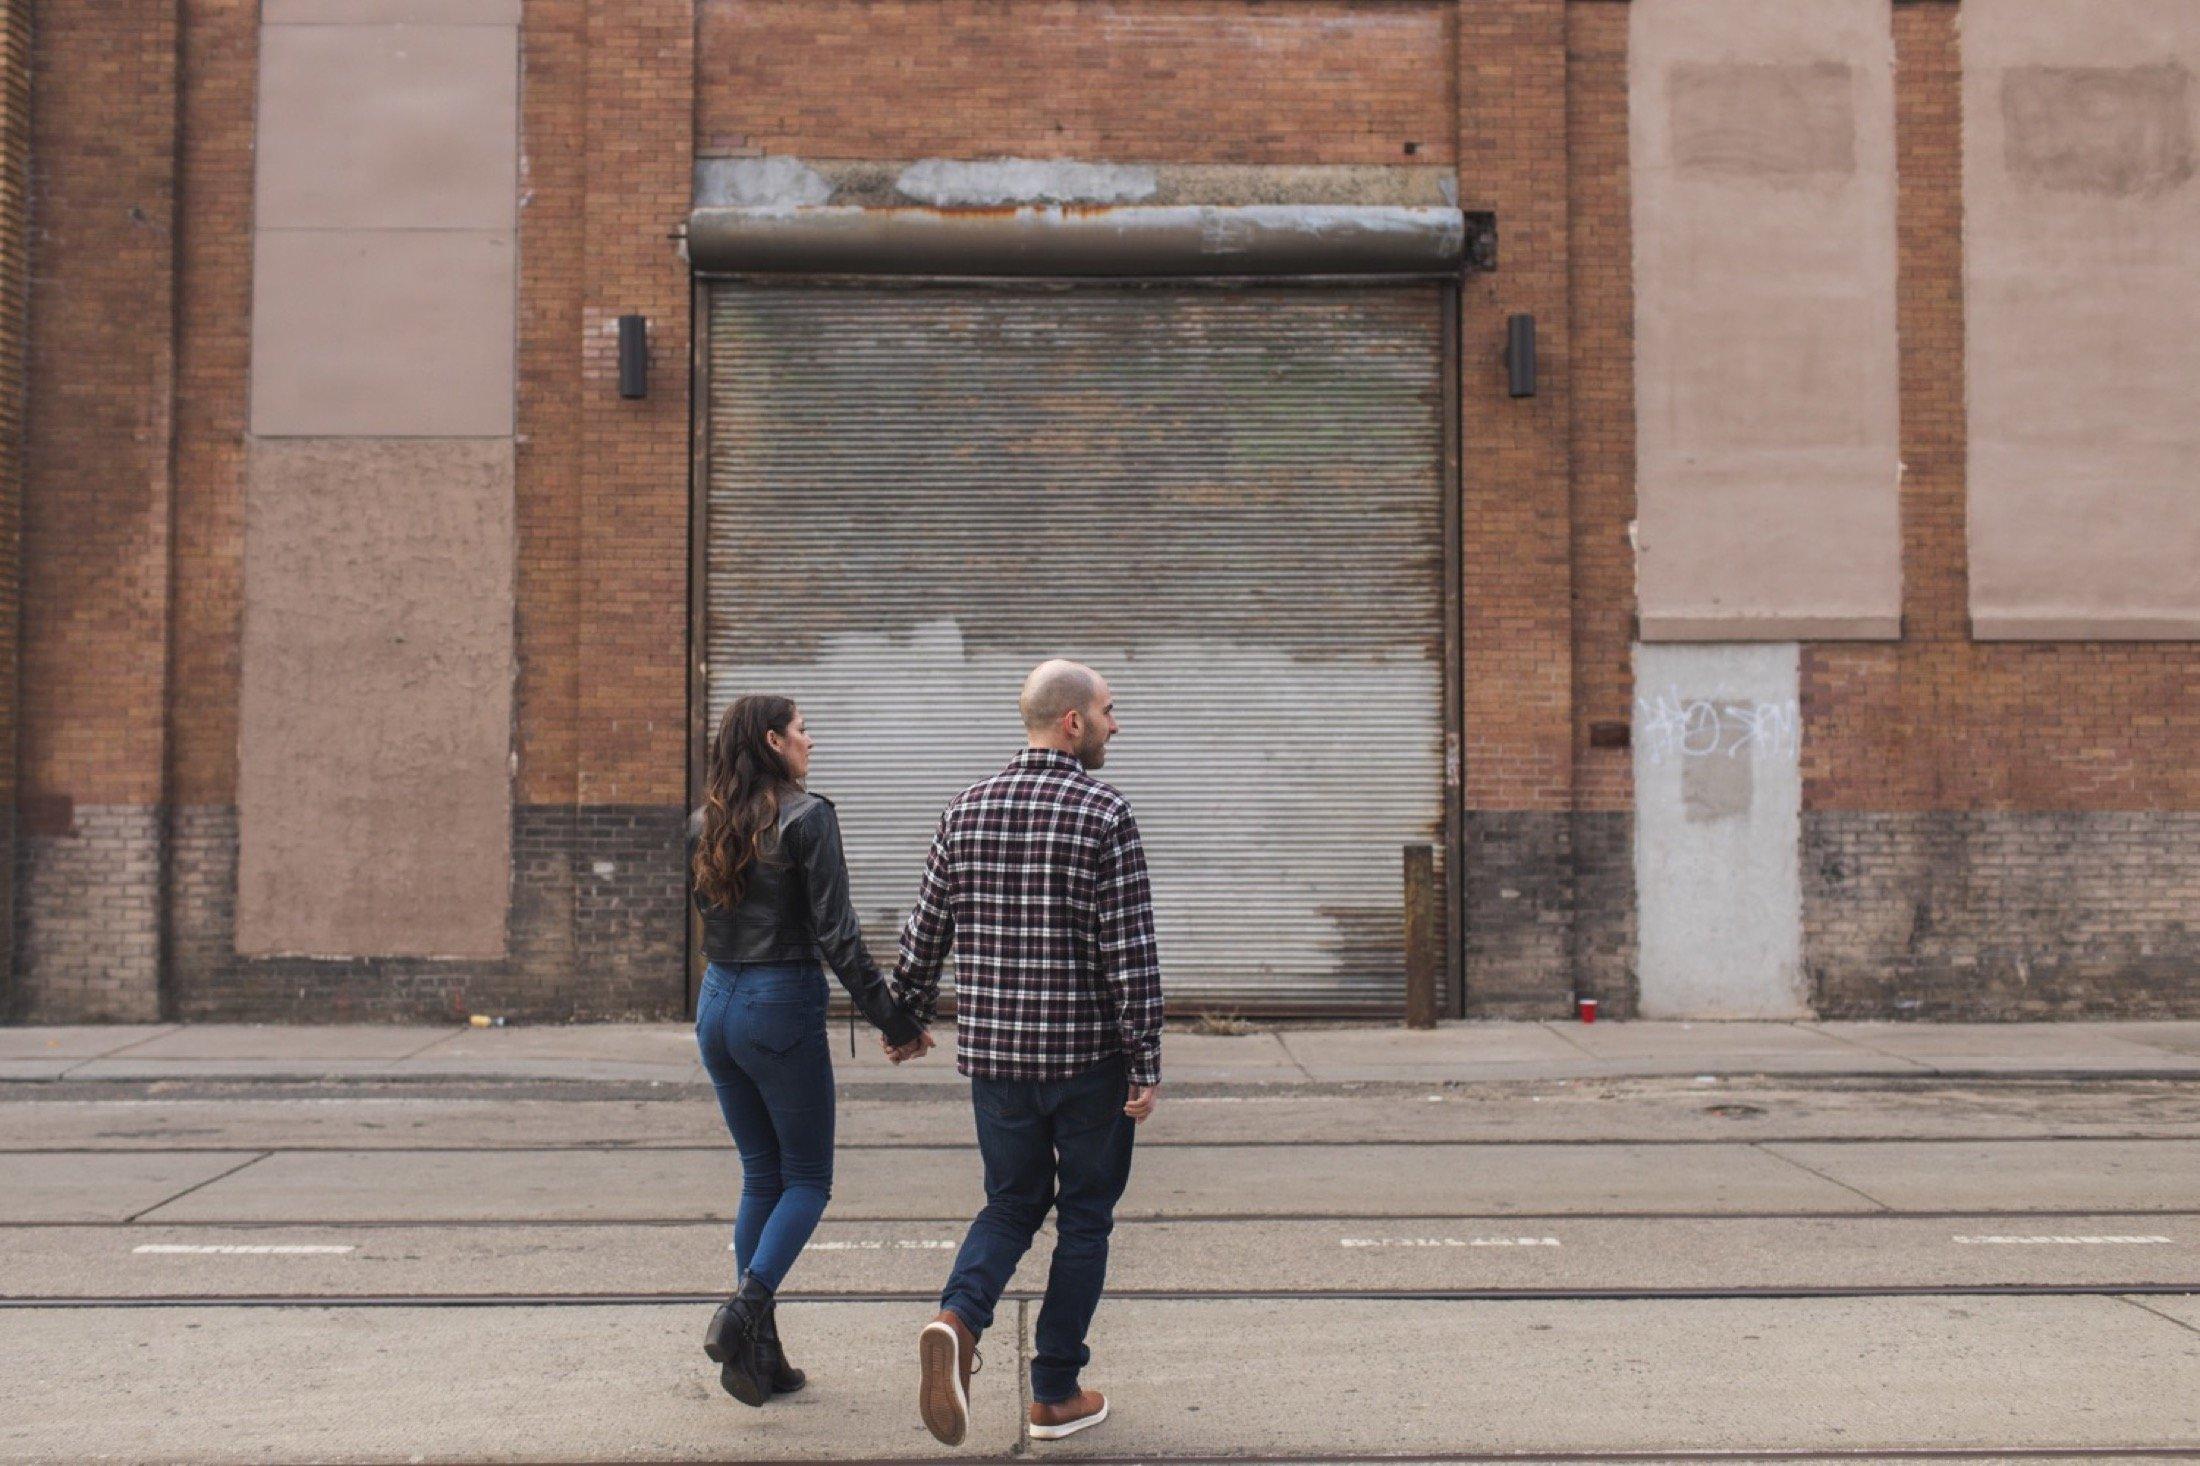 engagement session, Kensington, Philadelphia